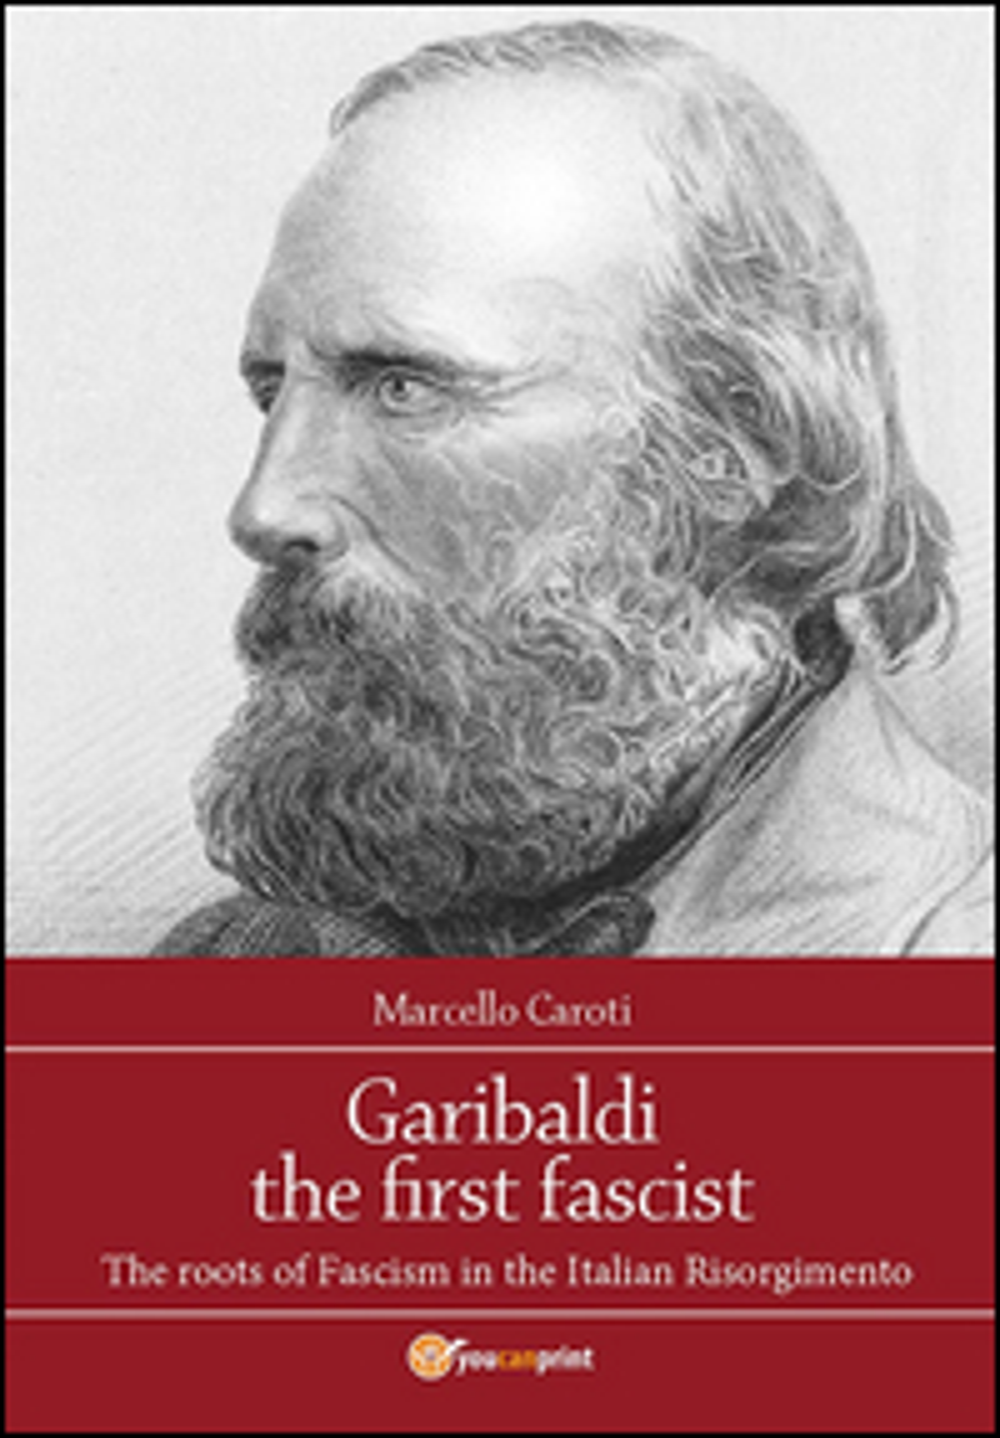 Garibaldi the first fascist